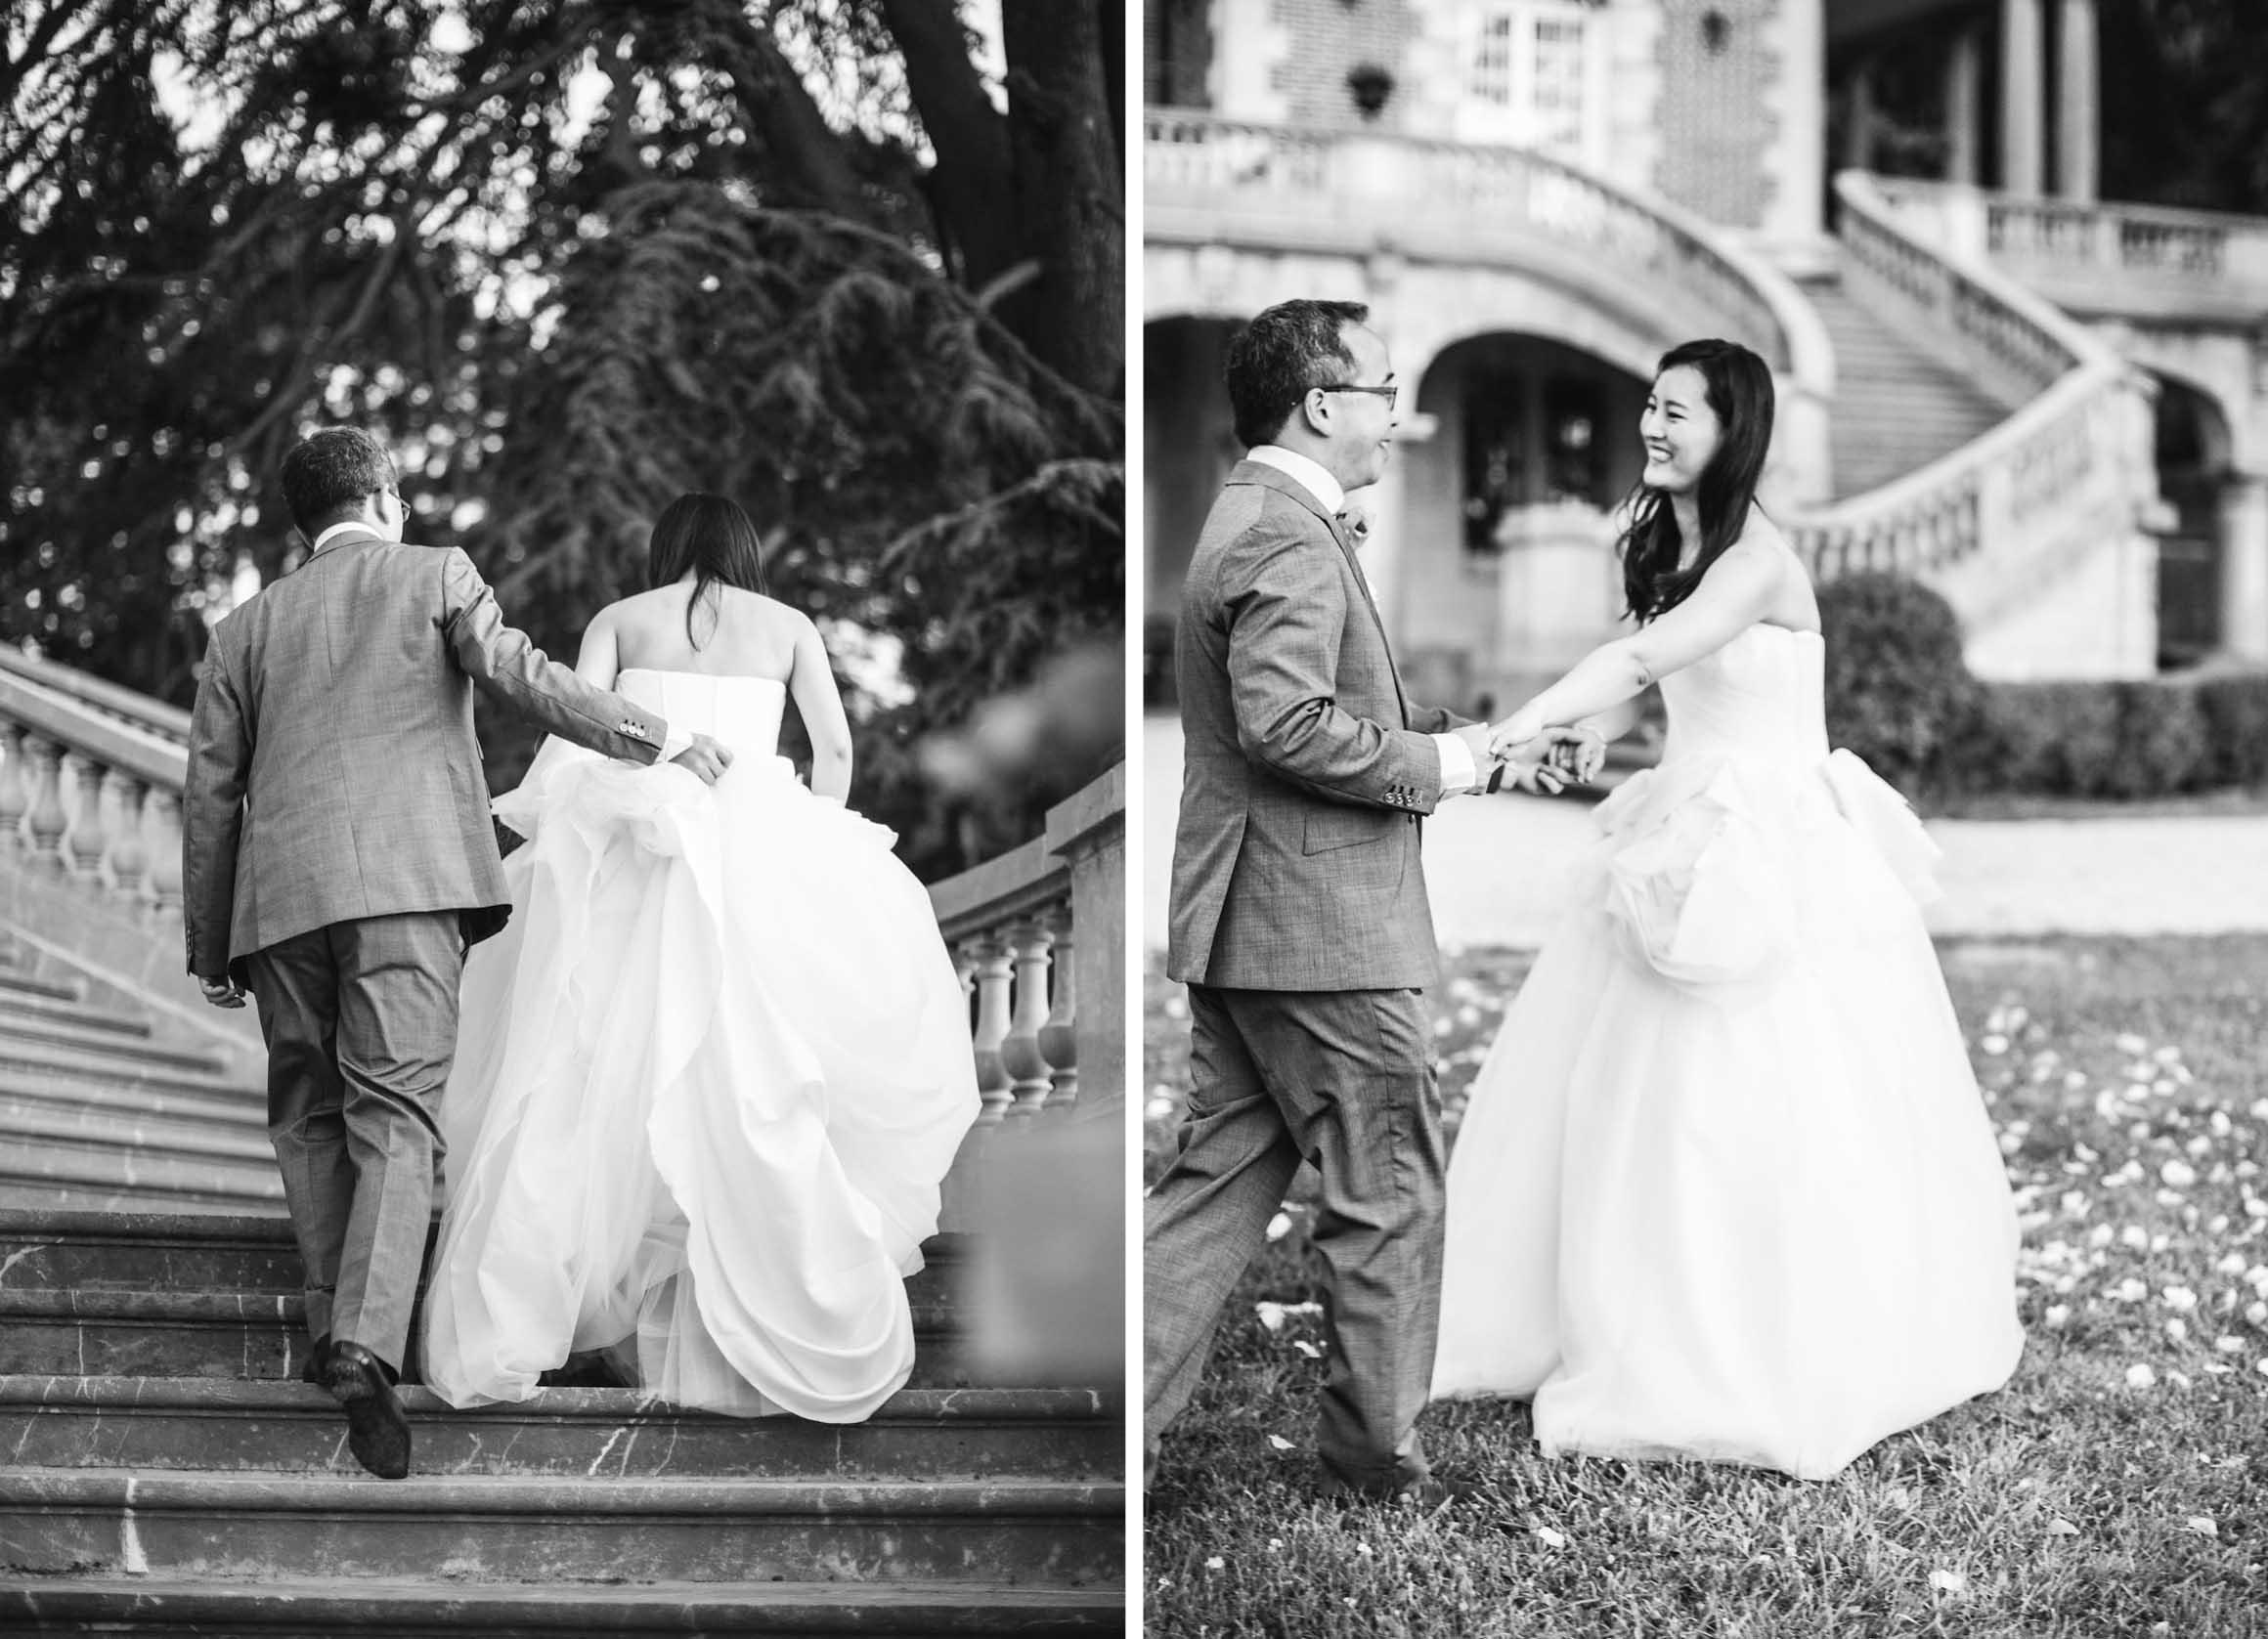 Amy O'Boyle Photography- Chateau Bouffemont Wedding- France Wedding Photographer 13.jpg